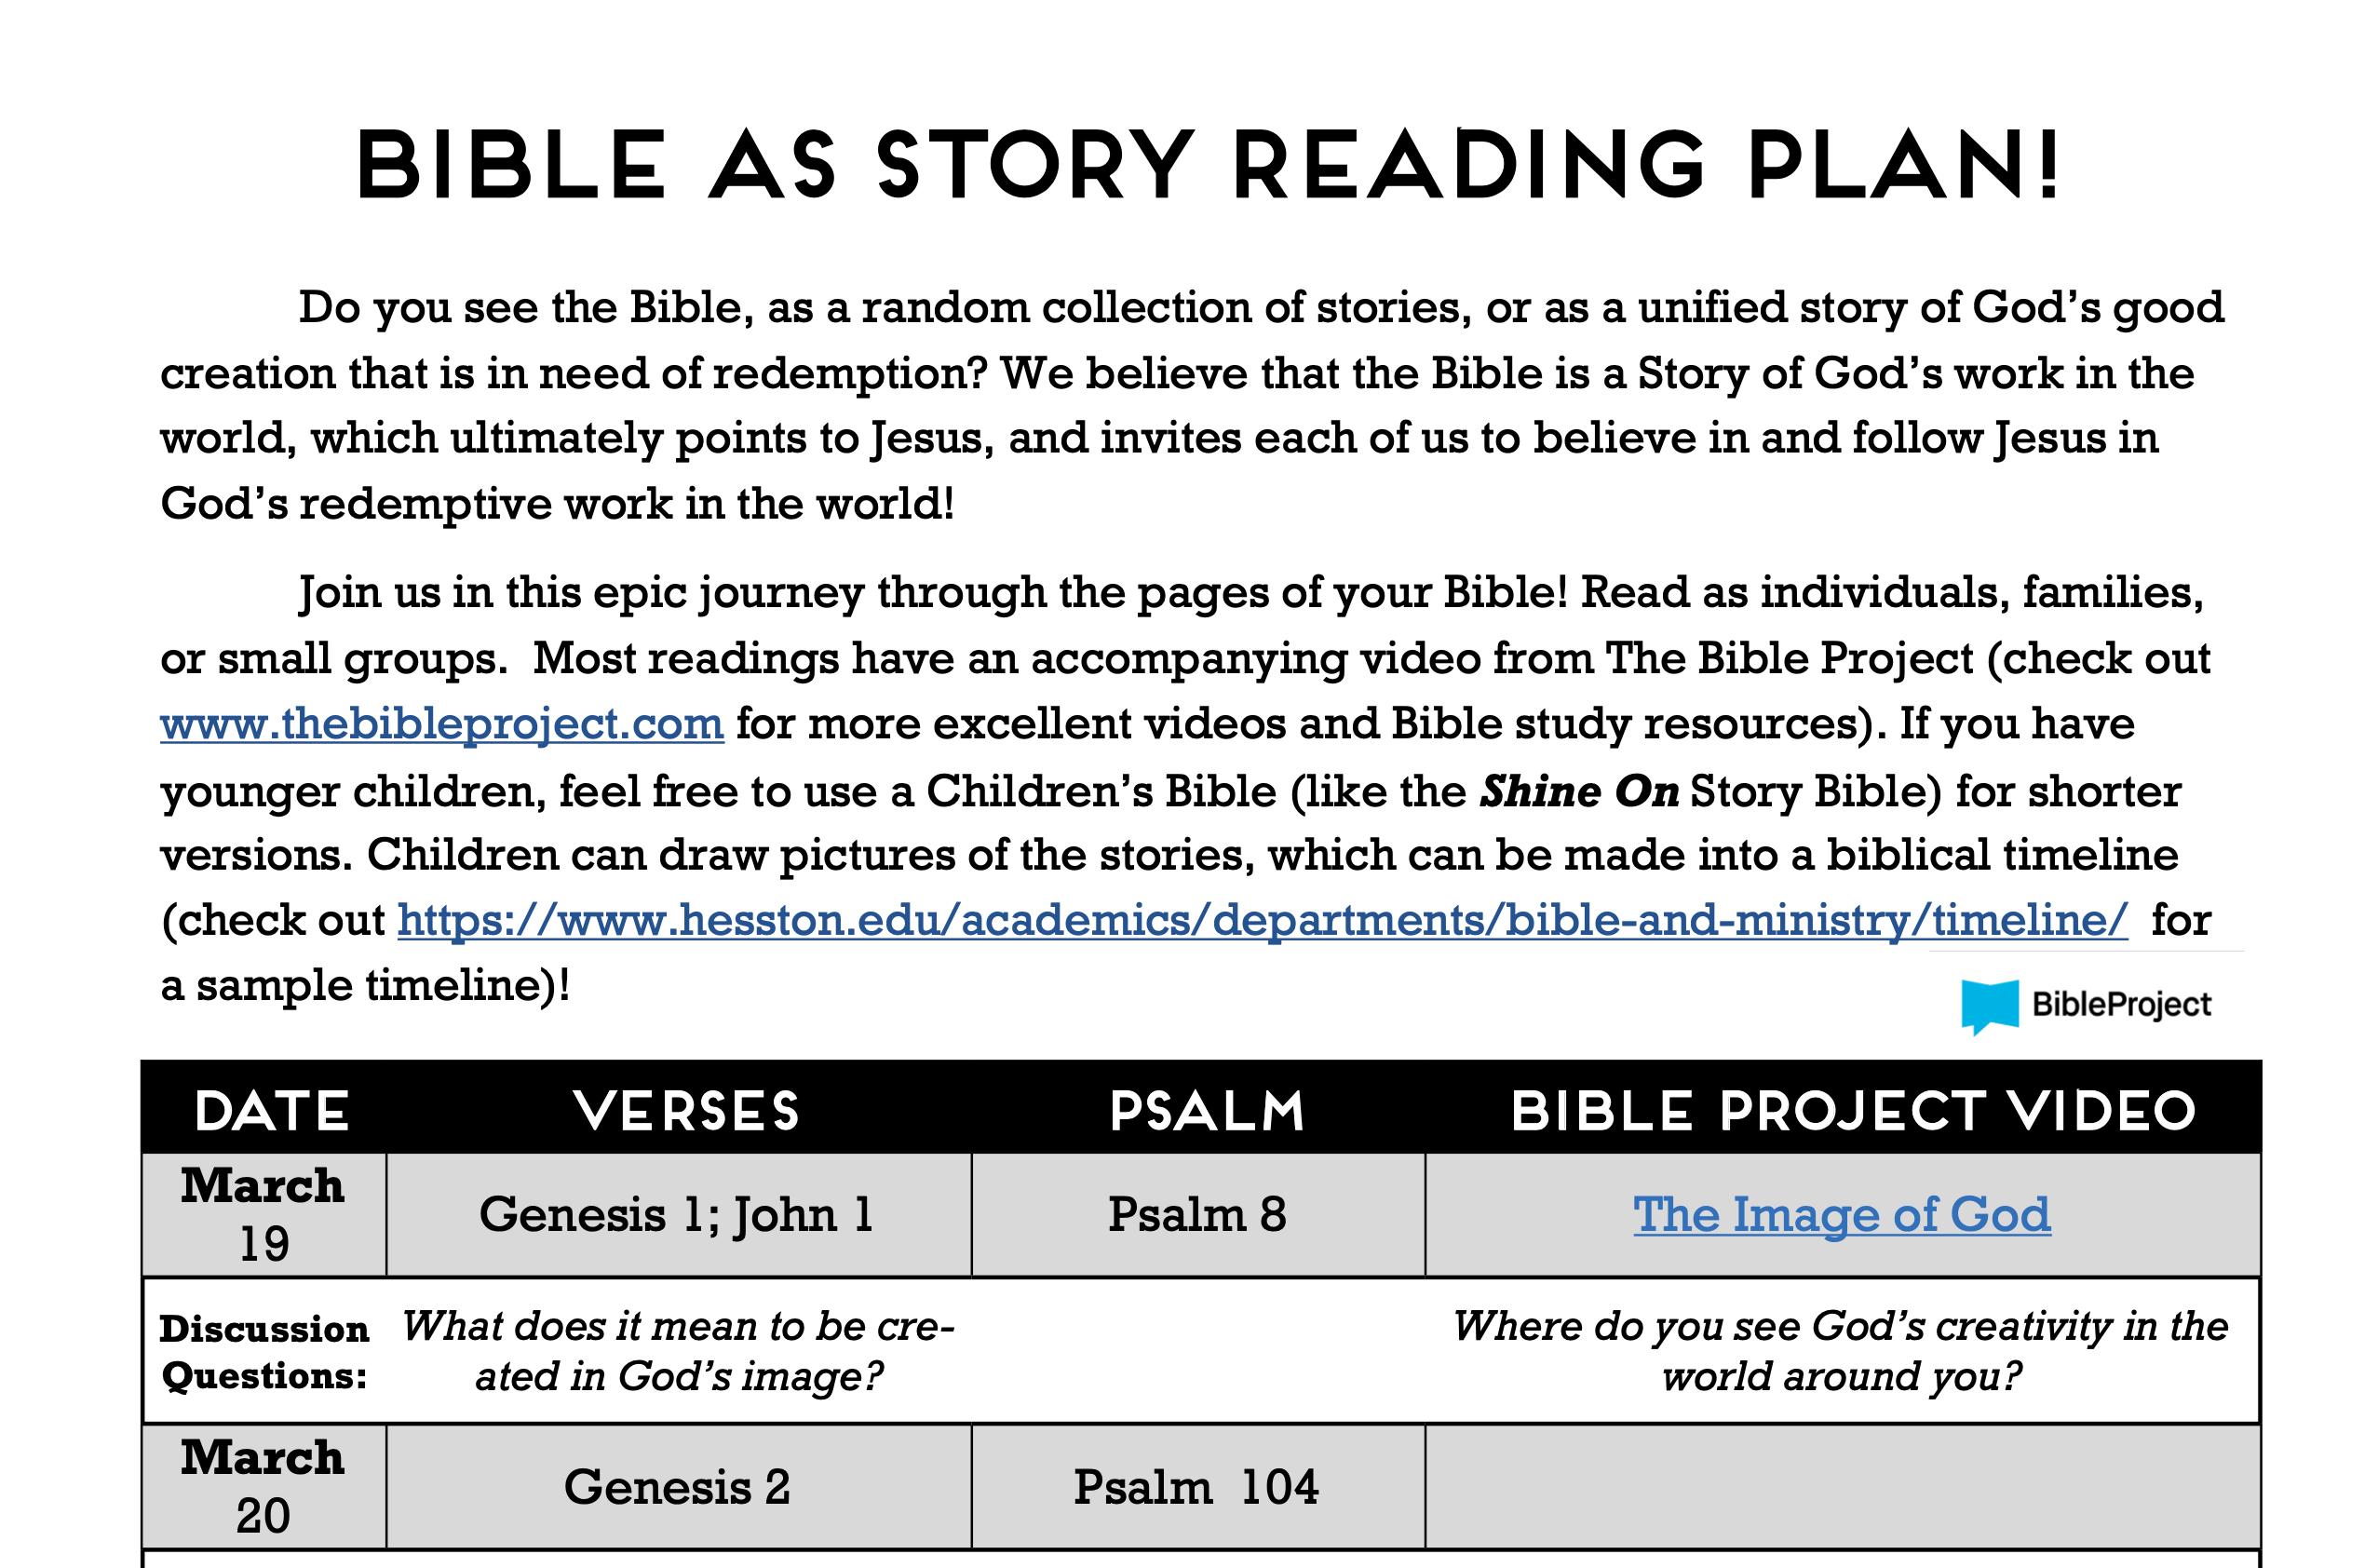 Bible as Story Reading Plan